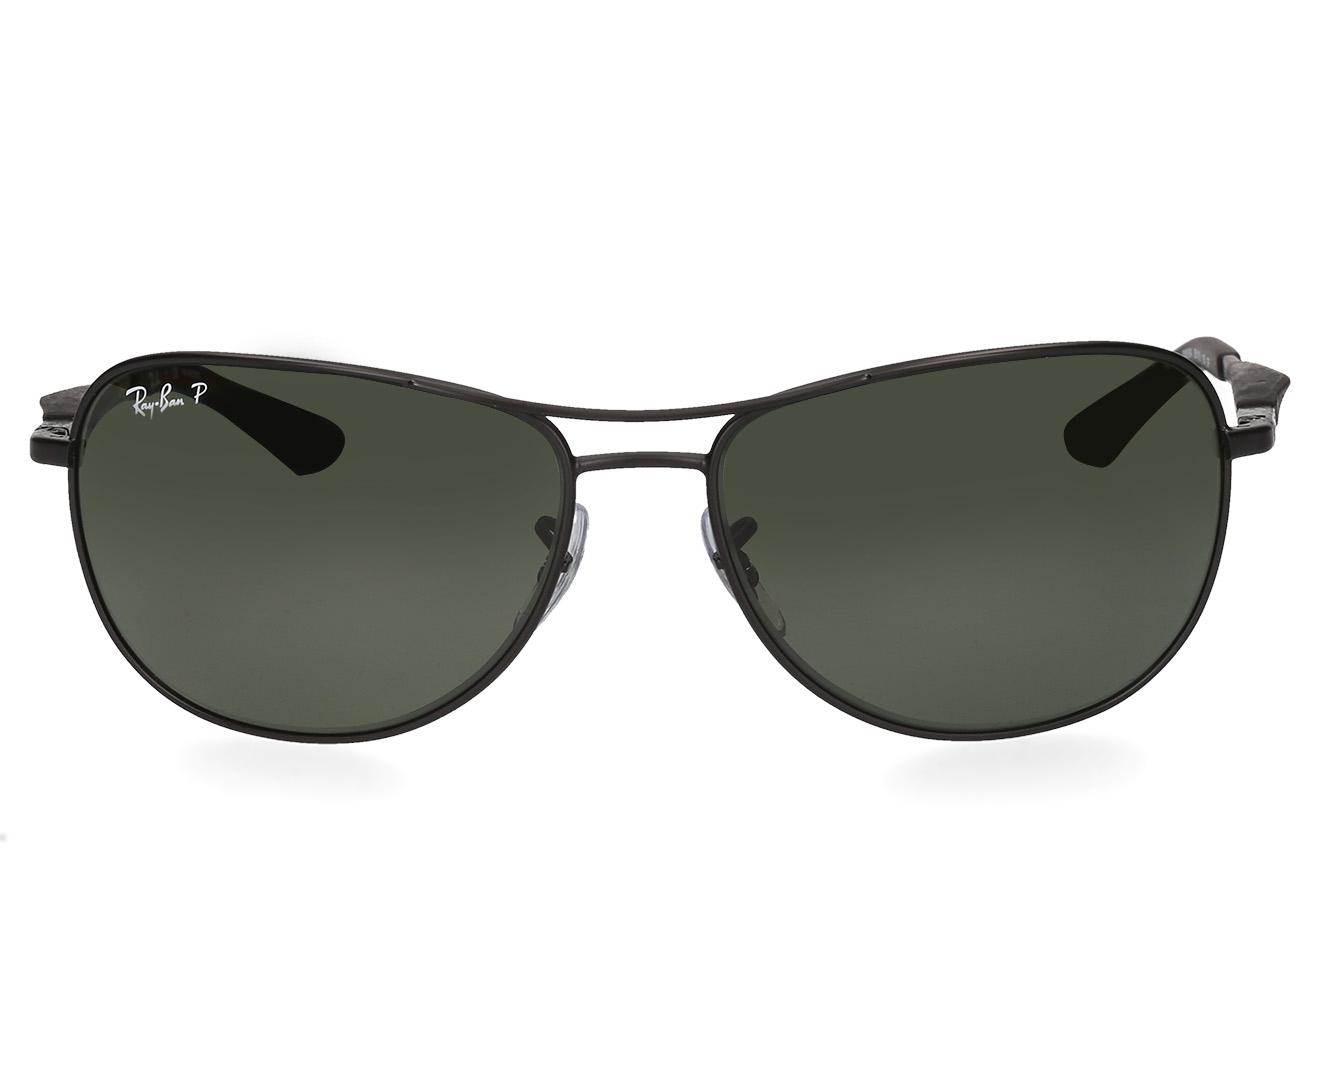 d896719348 Ray-Ban RB3519 Polarised Aviator Sunglasses - Matte Black Polar Green